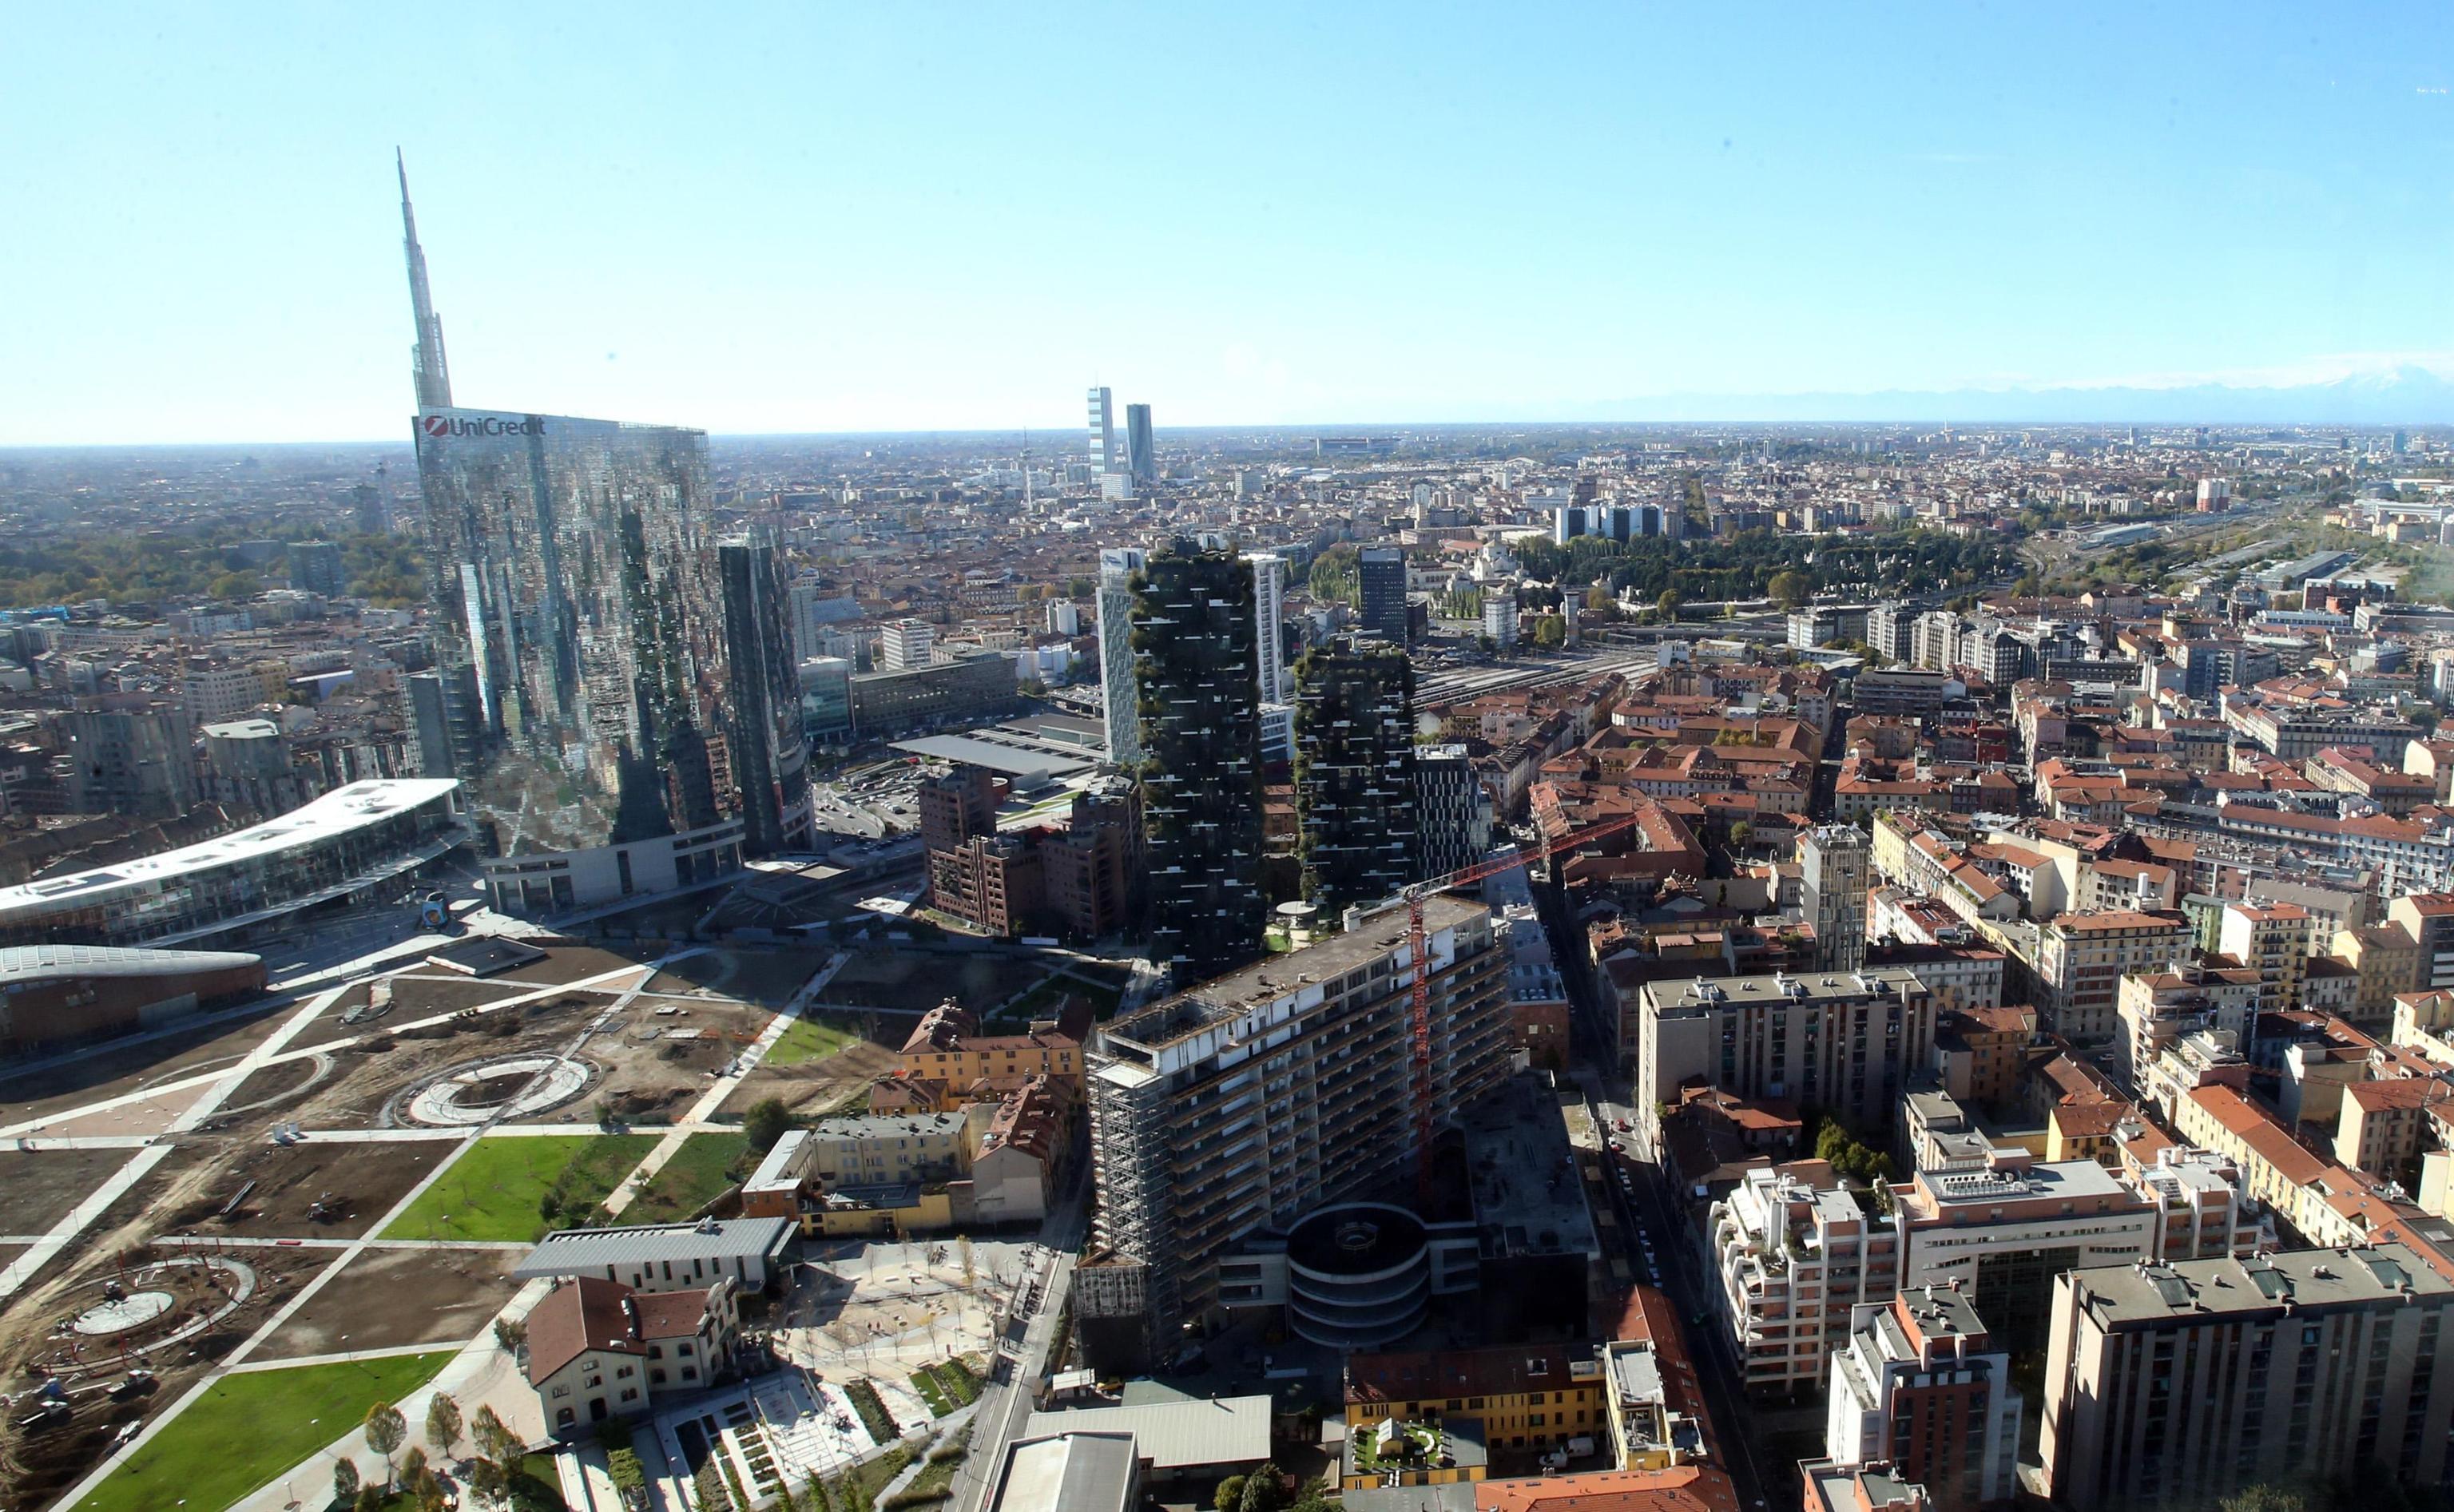 Milano citt pi 39 smart 39 d 39 italia virgilio notizie for Metropoli in italia